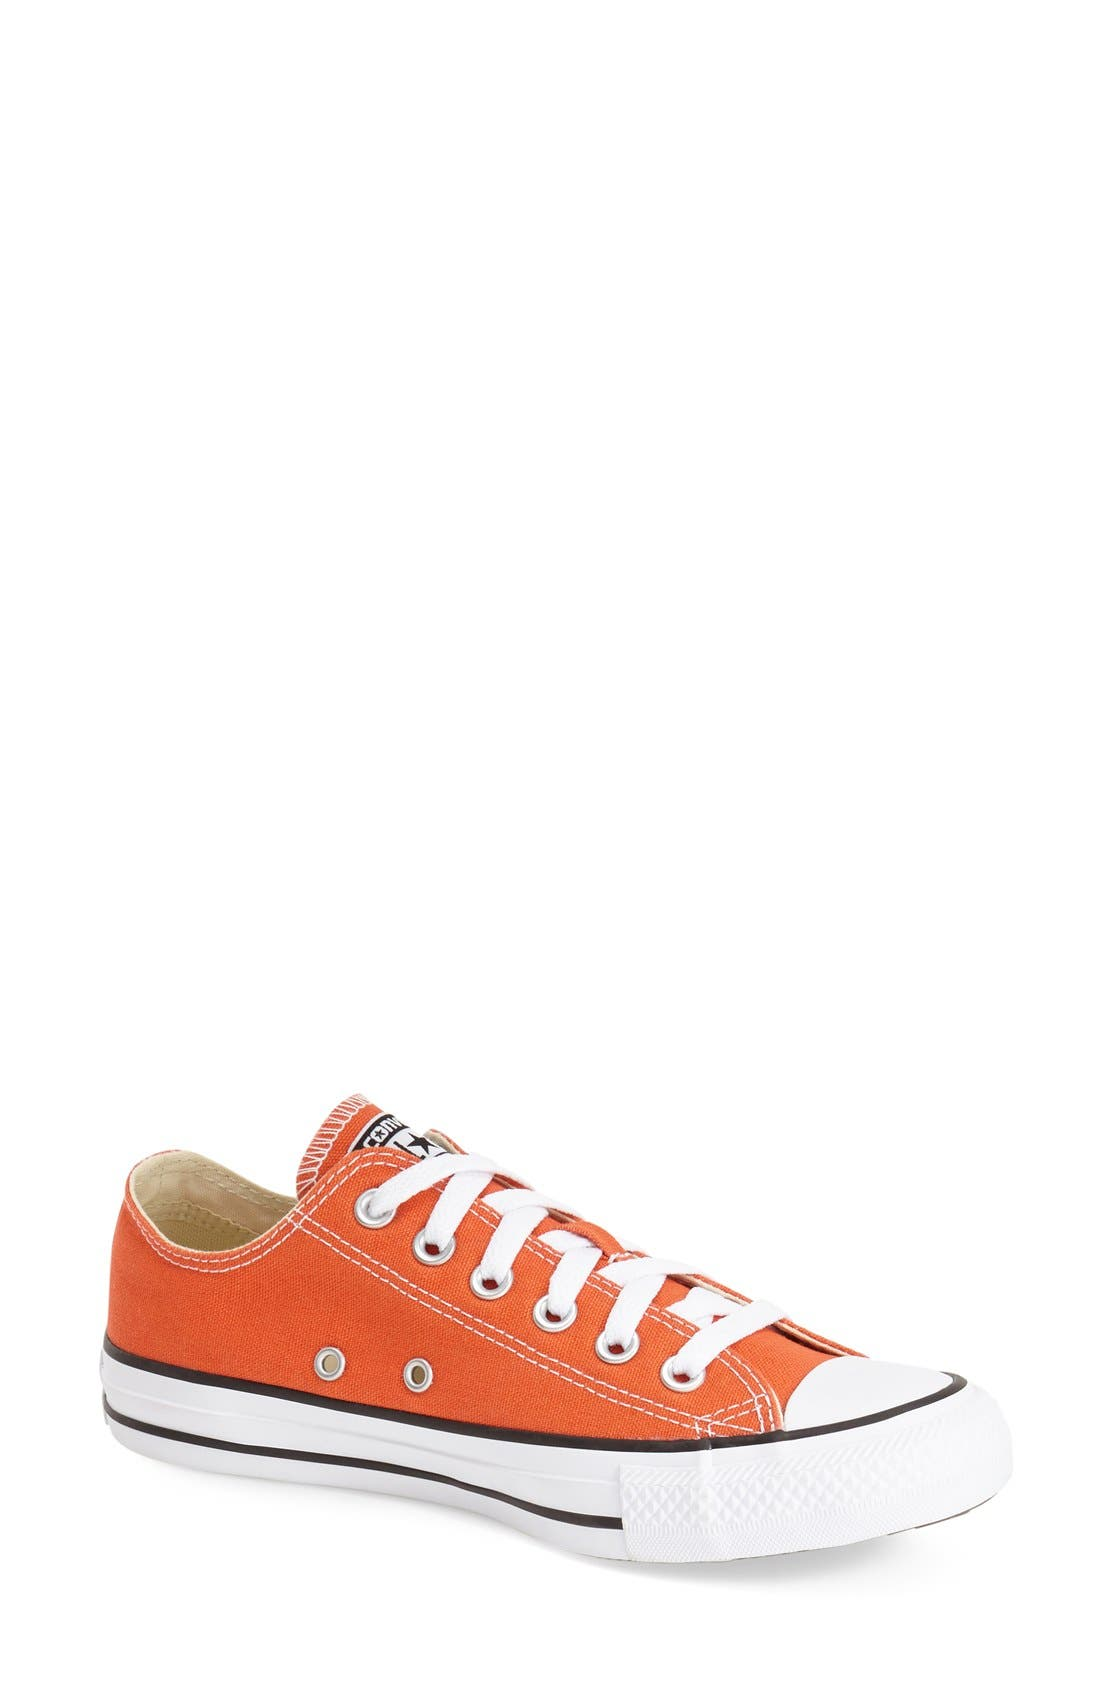 Alternate Image 1 Selected - Converse Chuck Taylor® All Star® 'Seasonal Ox' Low Top Sneaker (Women)